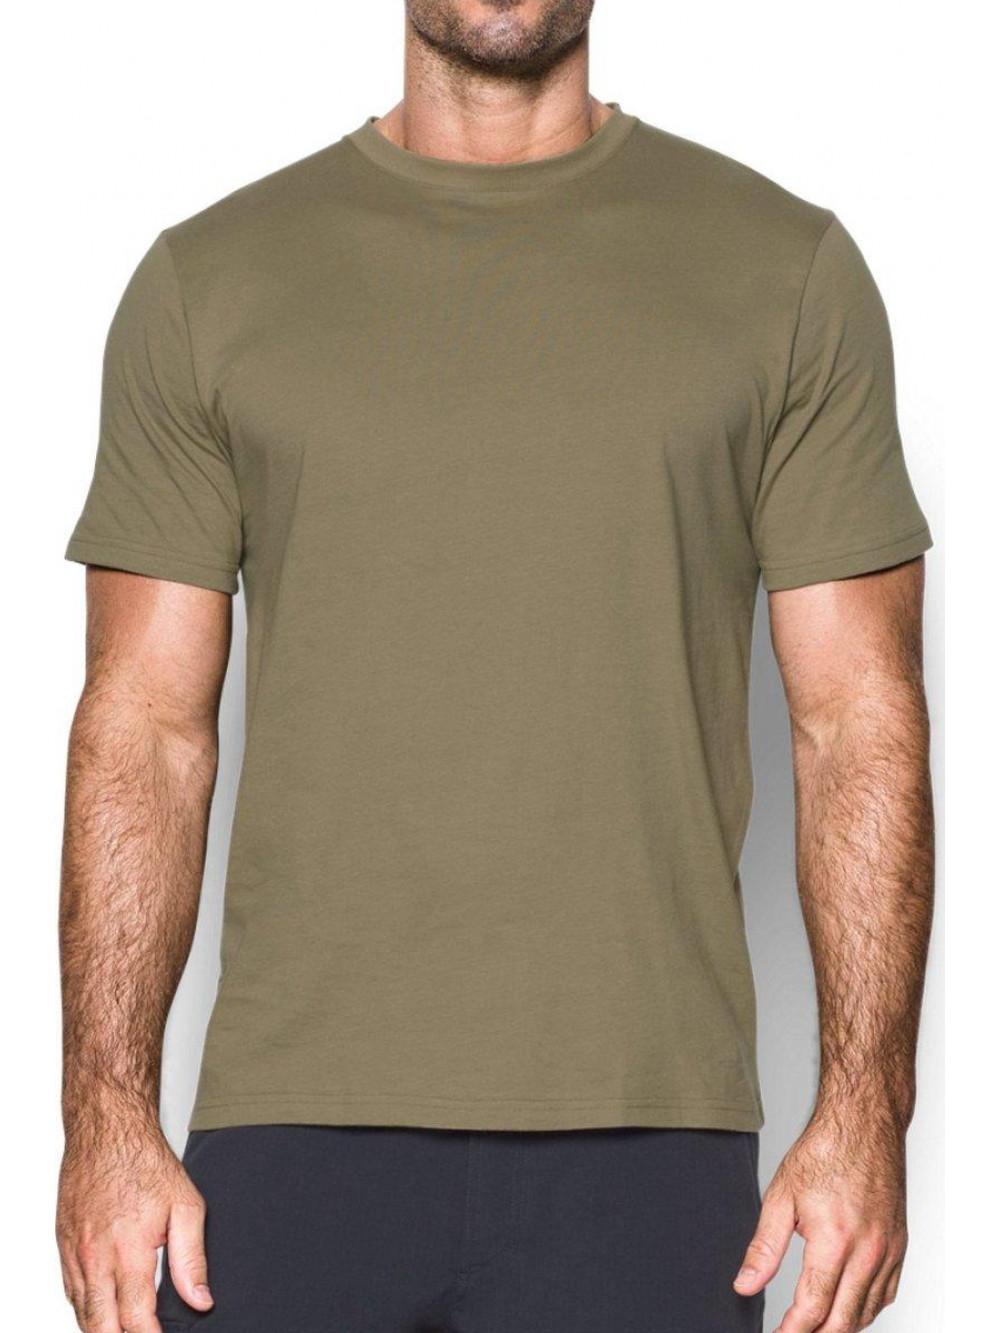 Tričko Under Armour Tactical army zelené